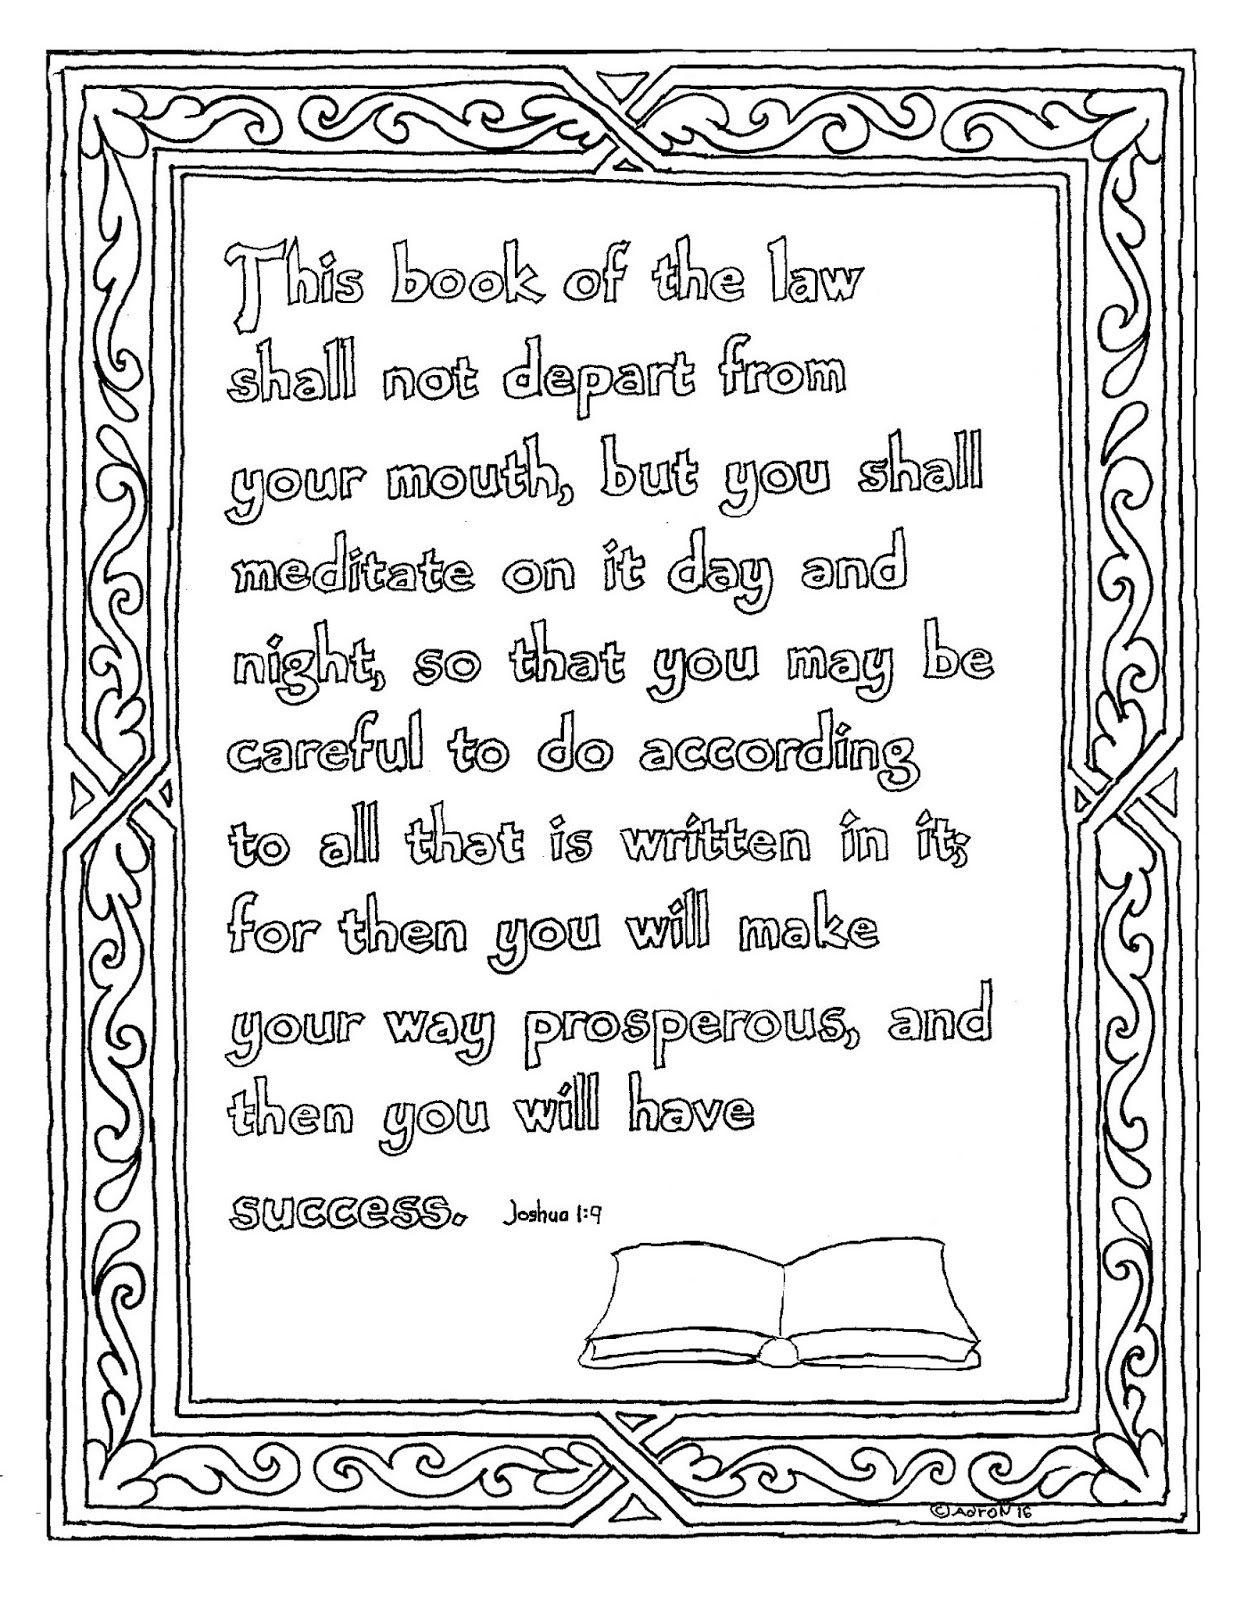 Joshua 1 8 Printable Bible Verse Coloring Page This Printable Coloring Page Is Not Only For